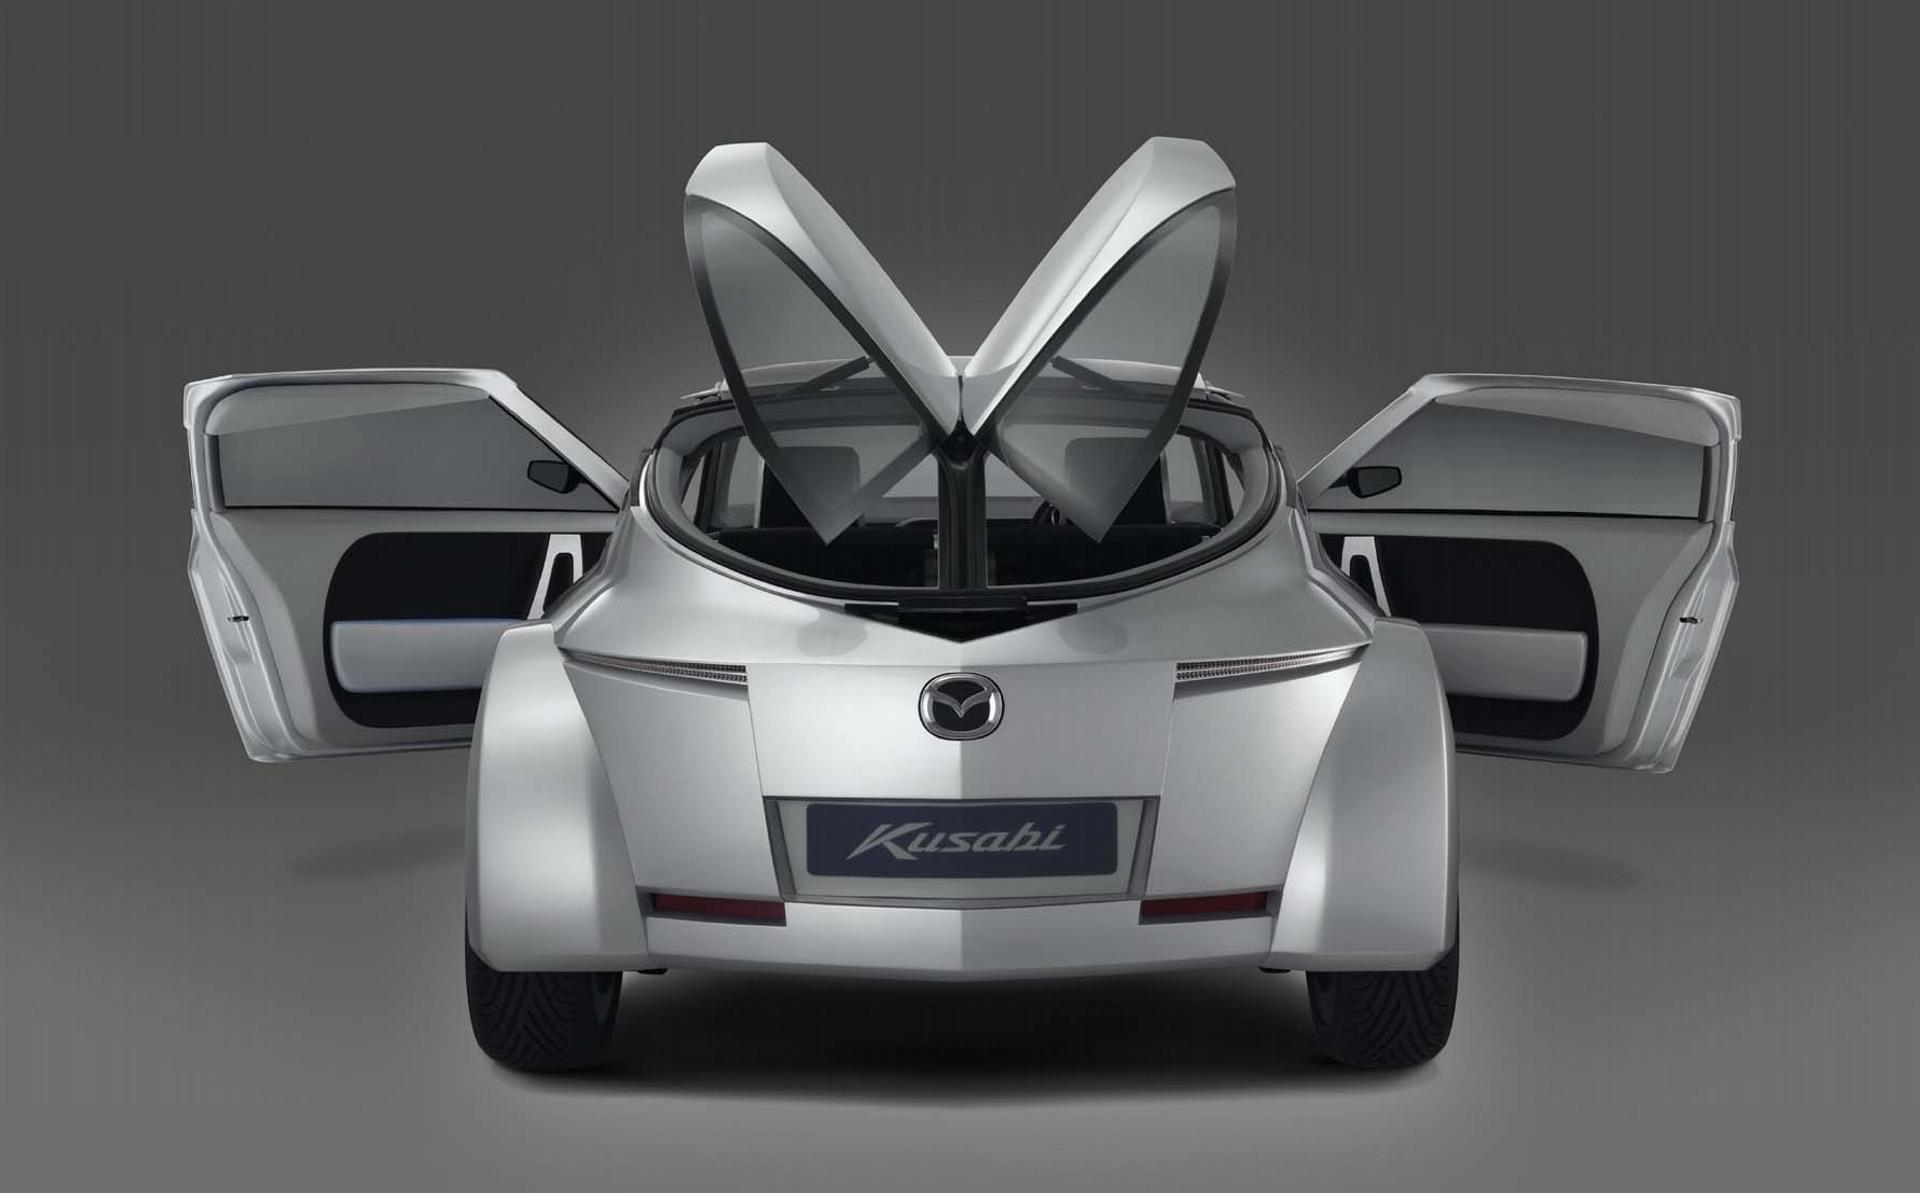 https://www.conceptcarz.com/images/Mazda/Mazda-Kusabi-Concept-Image-06.jpg